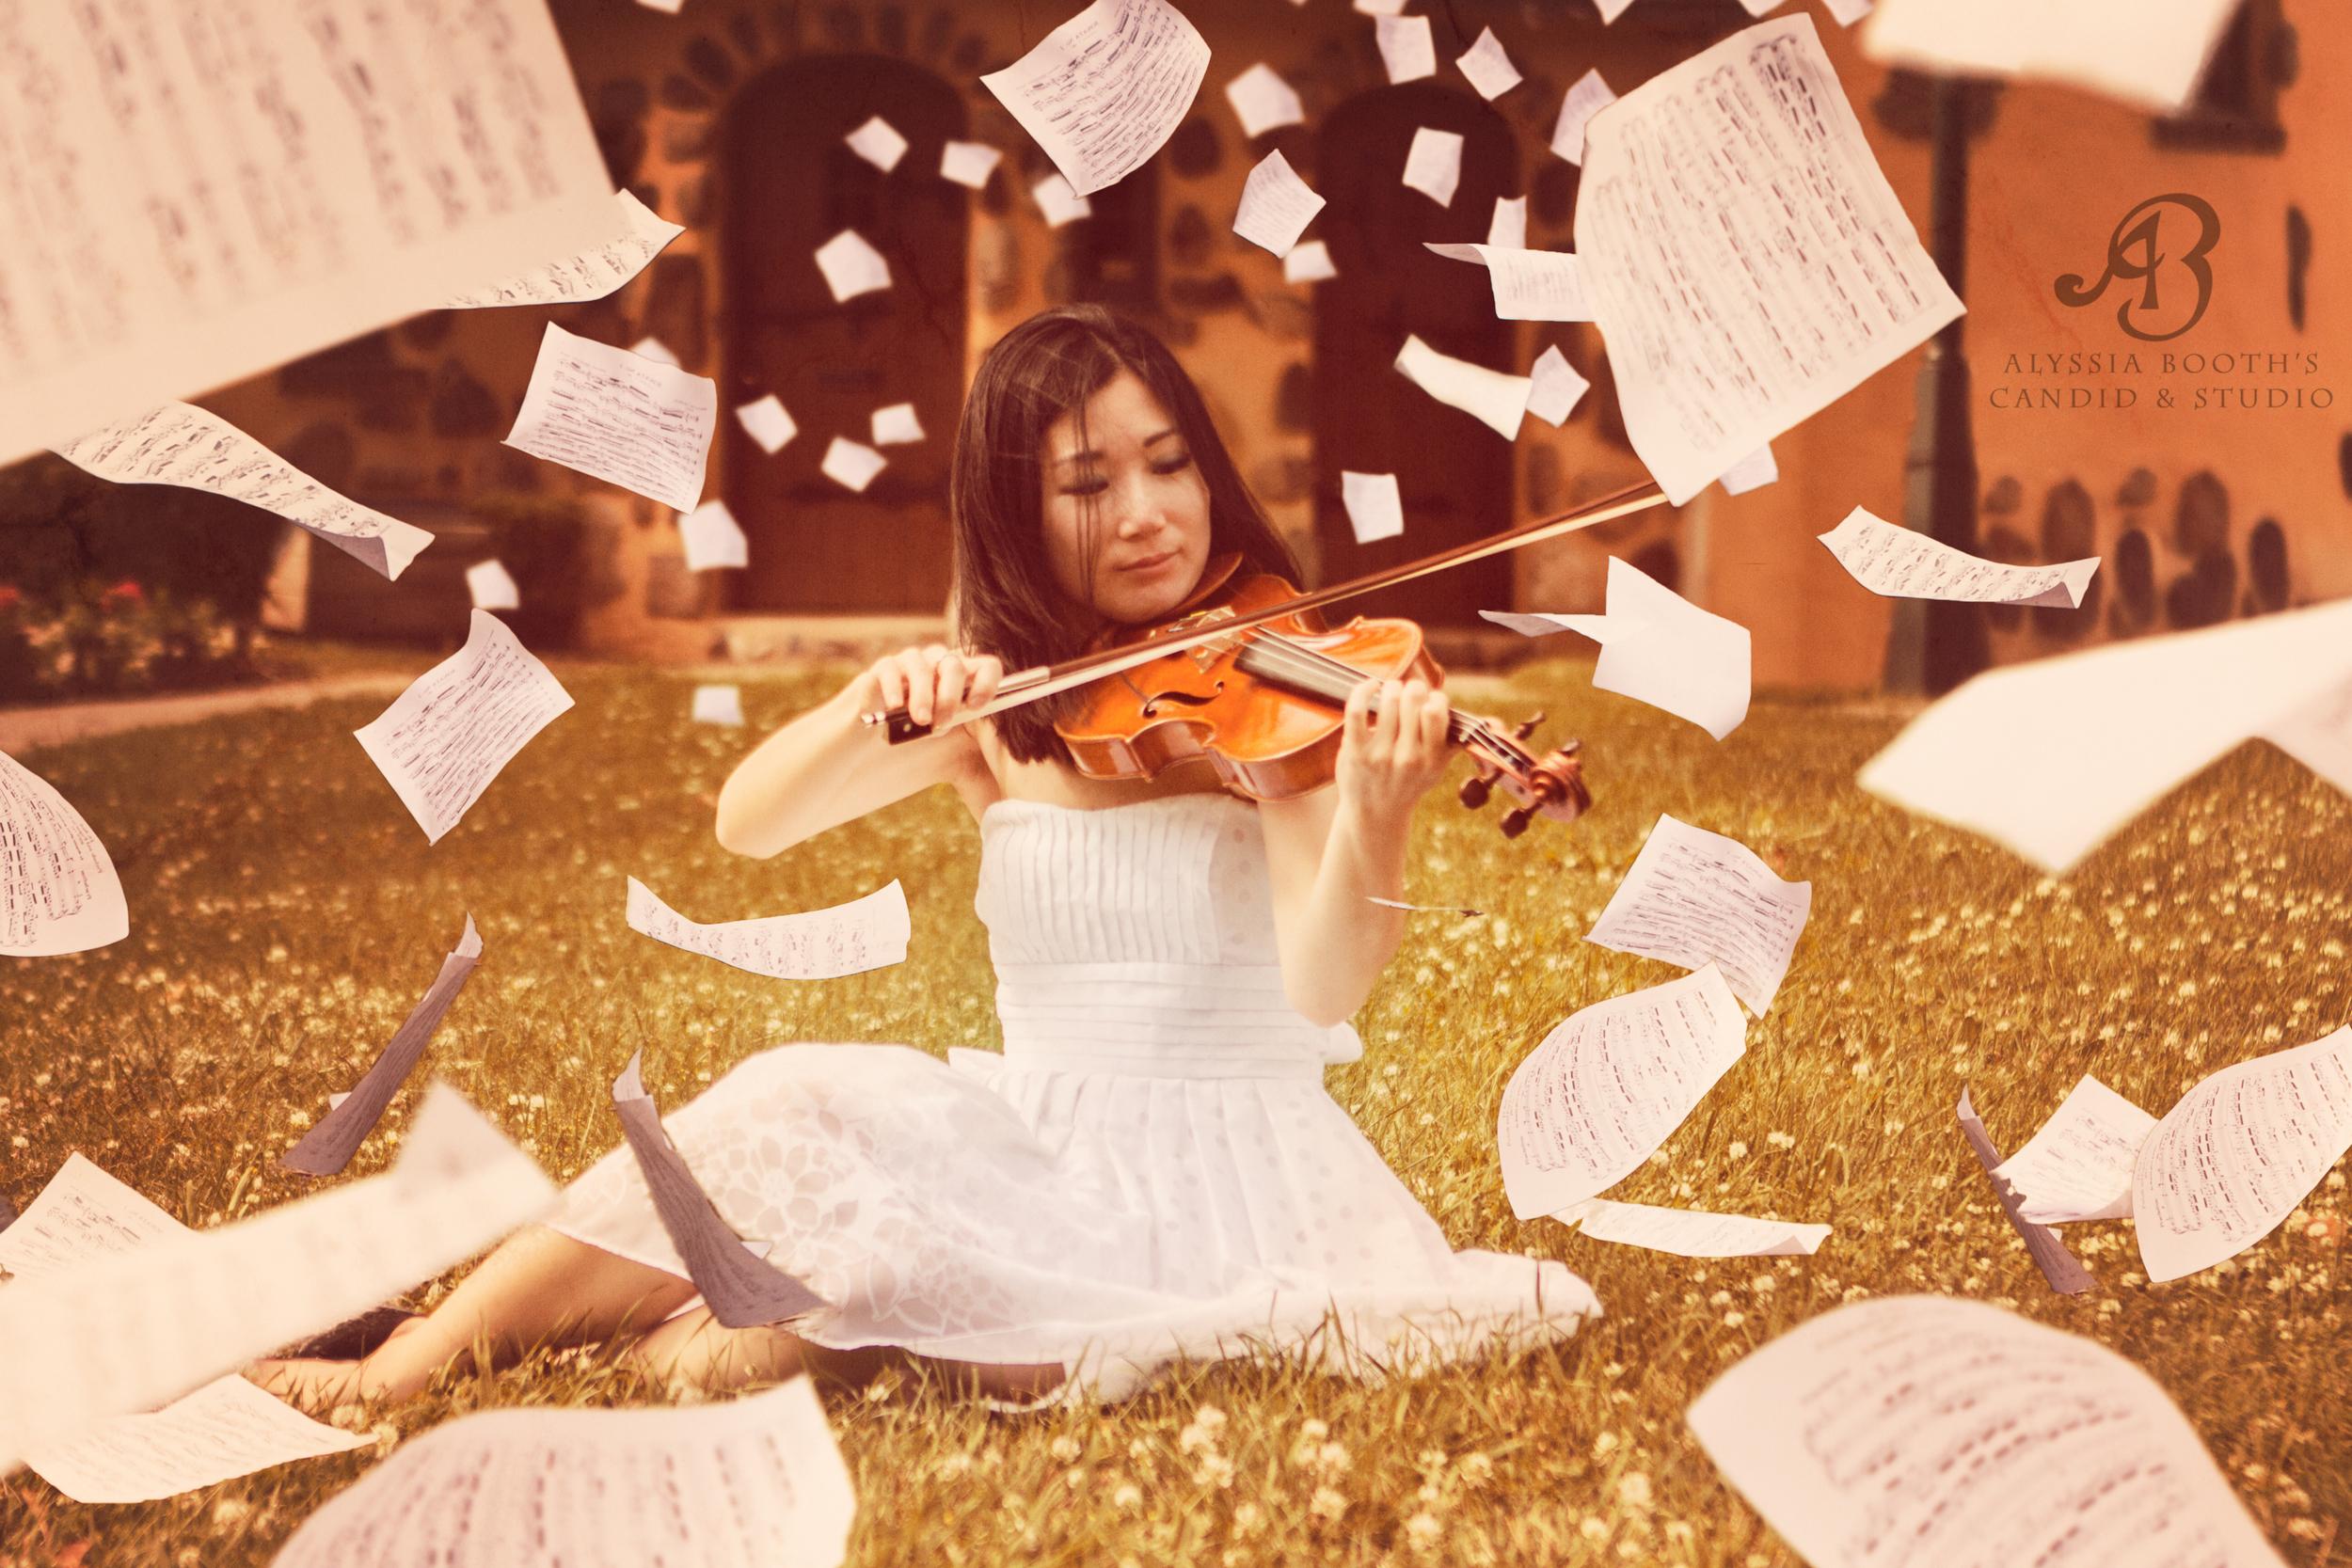 Music Maelstrom